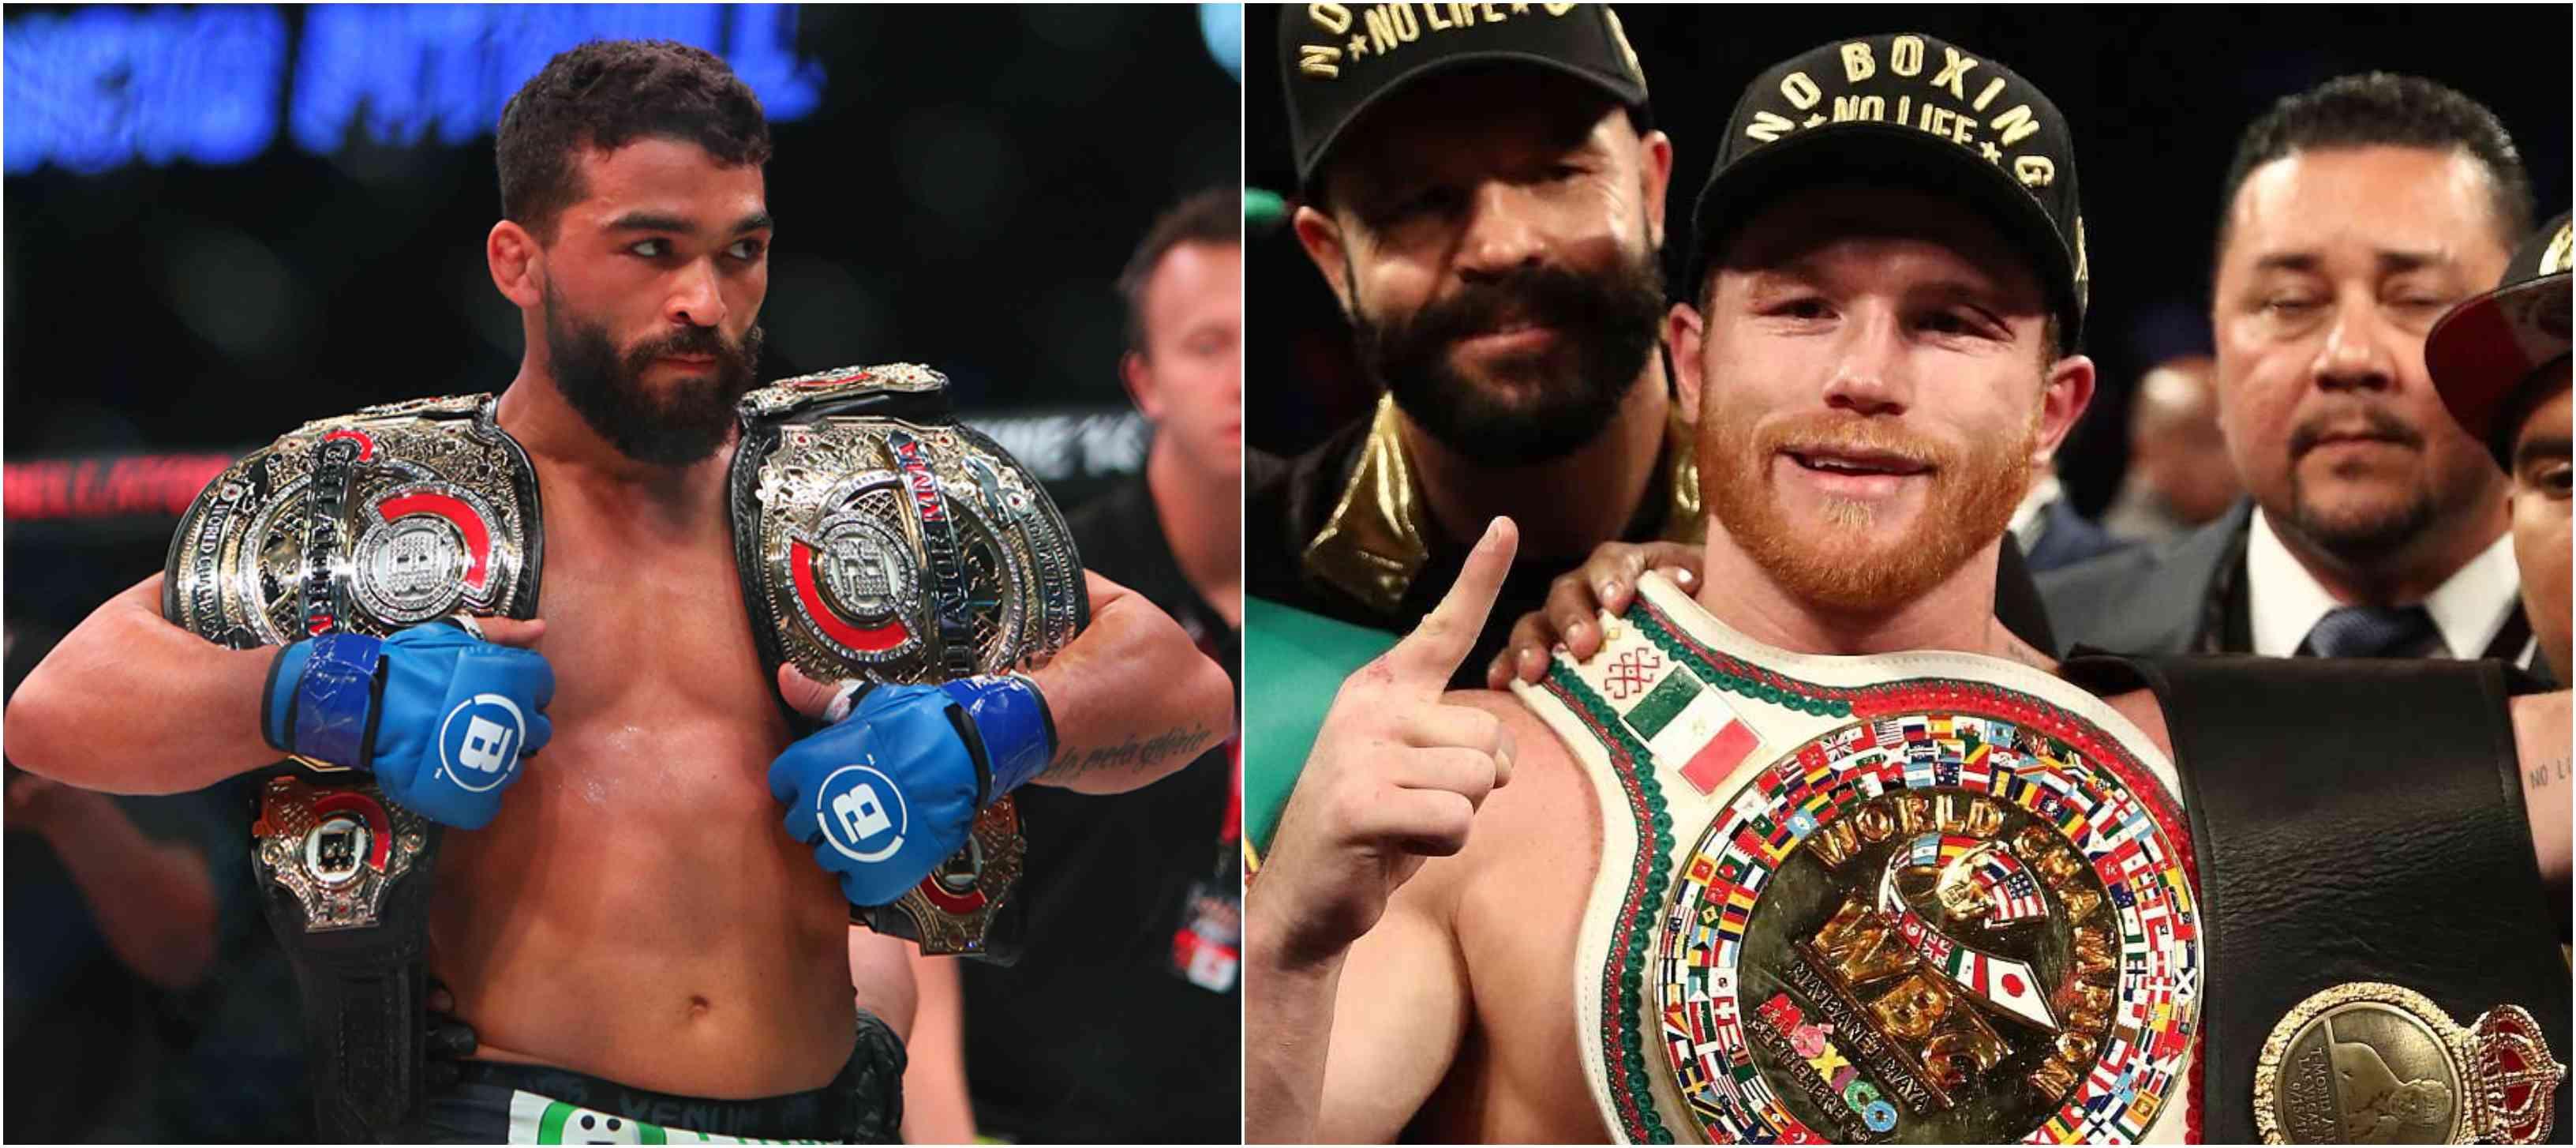 Bellator double champ Patricio Freire calls out Boxing superstar Canelo Alvarez - Patricio